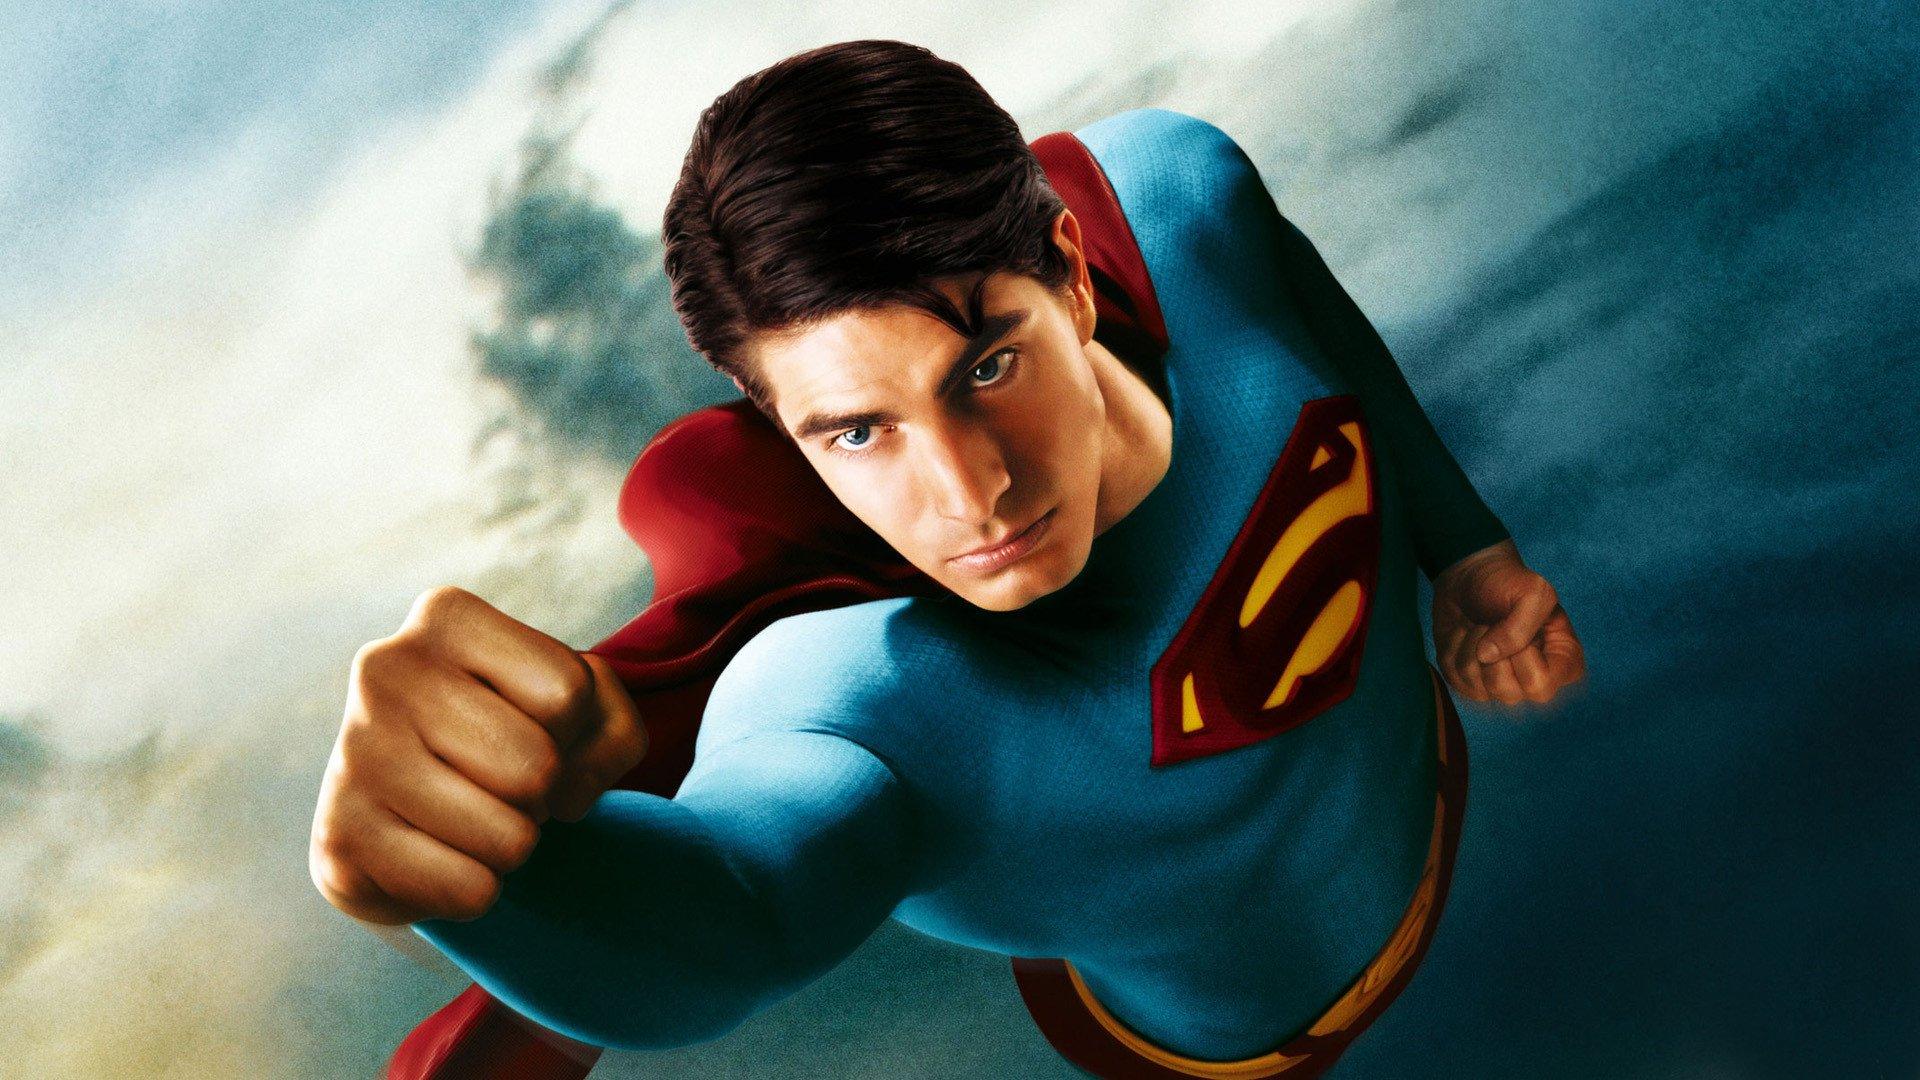 Superman Returns Fondo De Pantalla Hd Fondo De Escritorio